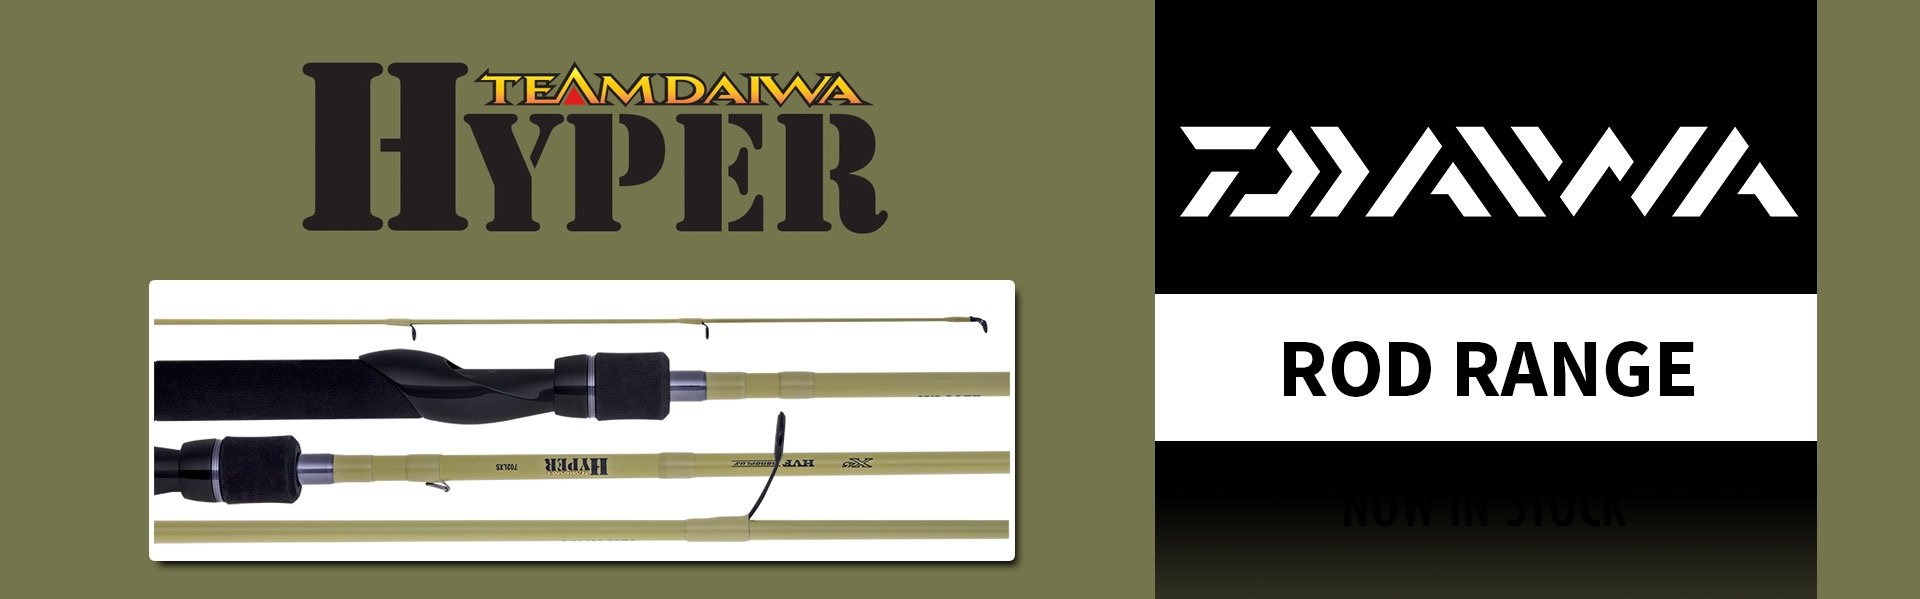 Daiwa Hyper Rods